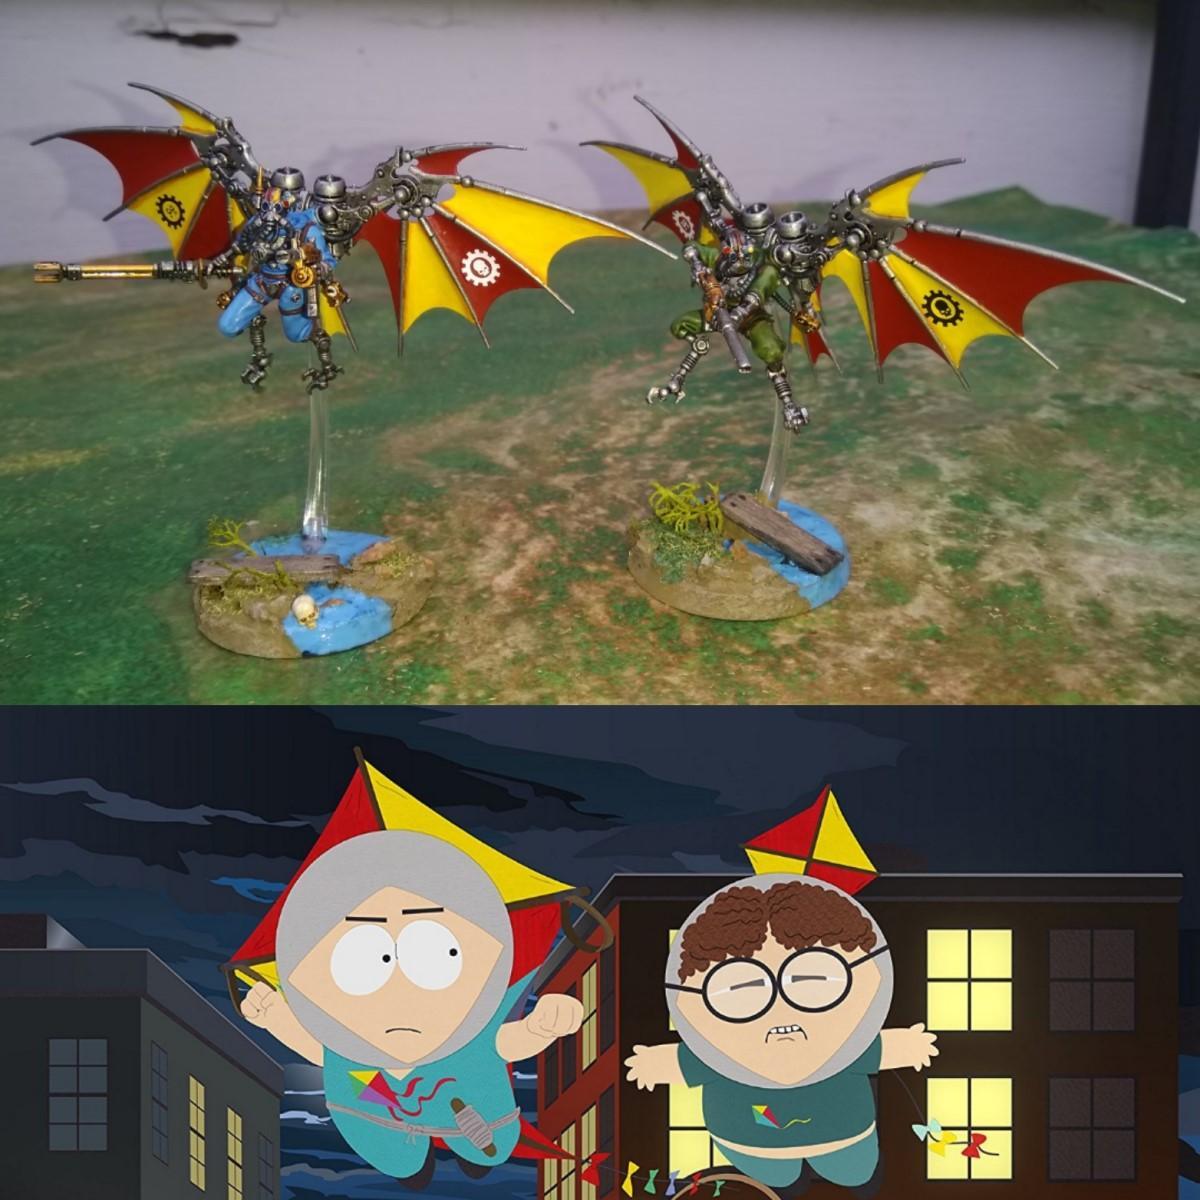 Adeptus Mechanicus, Comedy, Fan Art, Human Kite, Humor, Memes, Pteraxii, South Park